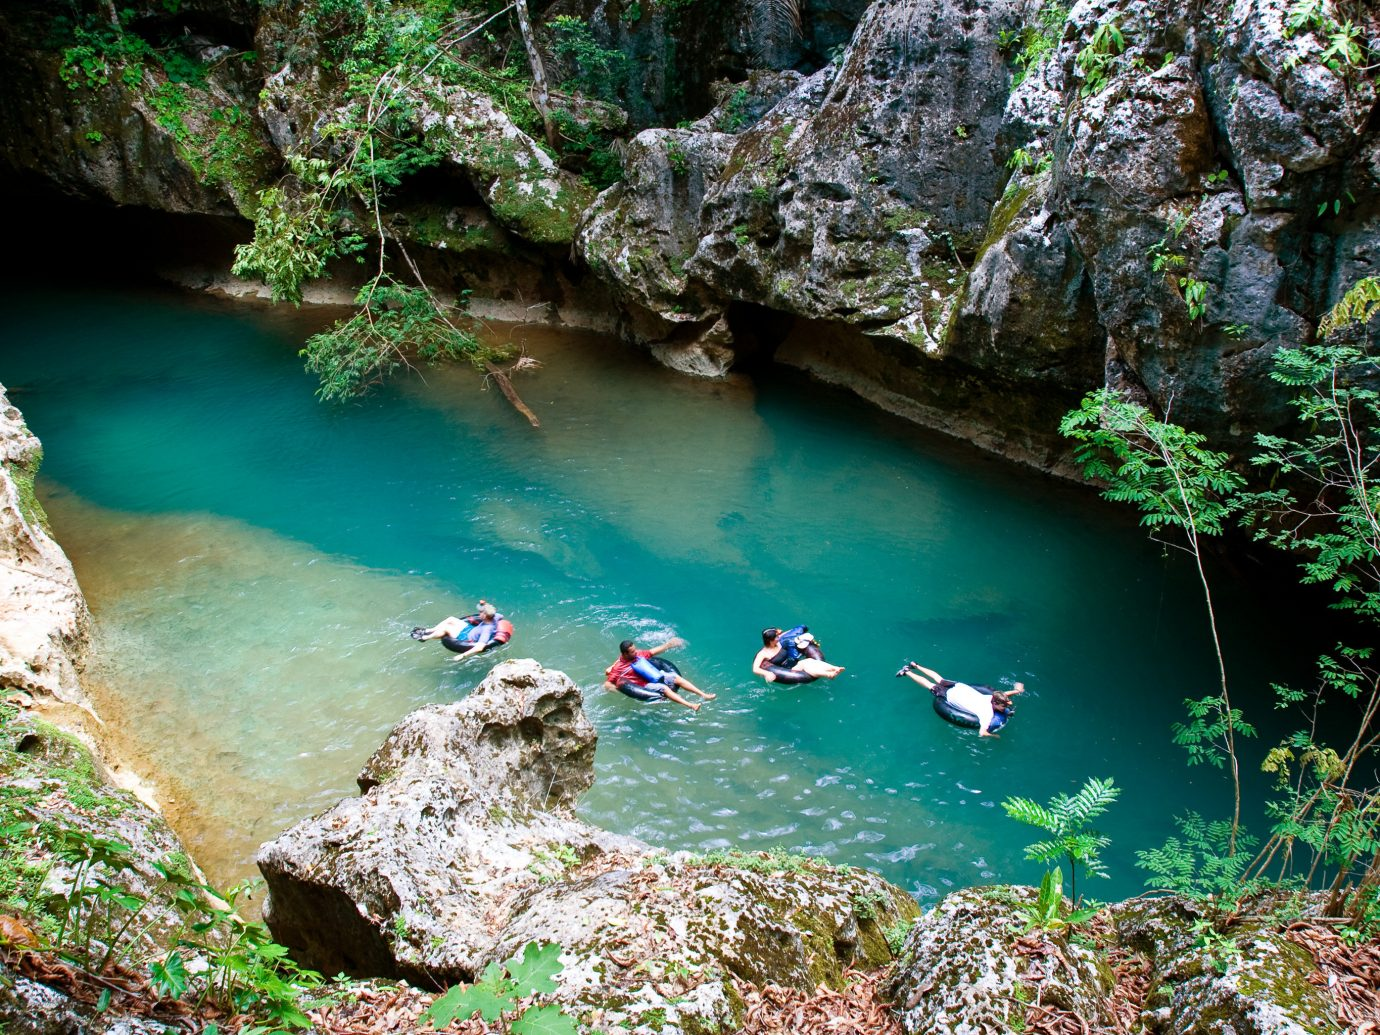 Swimming hole at Ka'ana Resort, San Ignacio, Belize